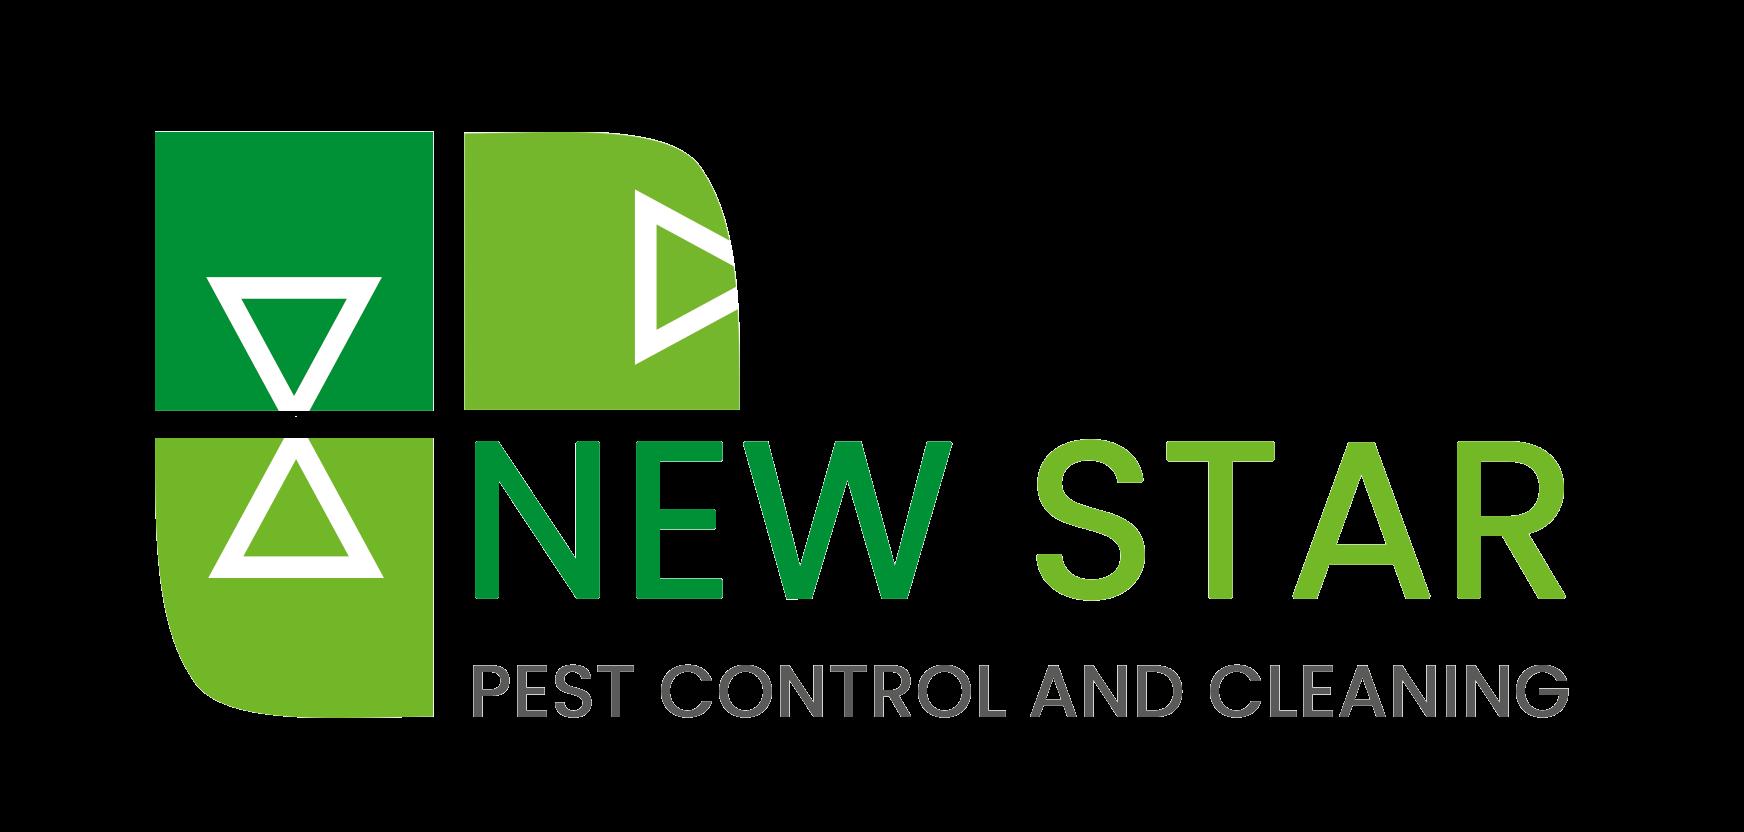 NEWSTAR PEST CONTROL SERVICE IN DUBAI logo